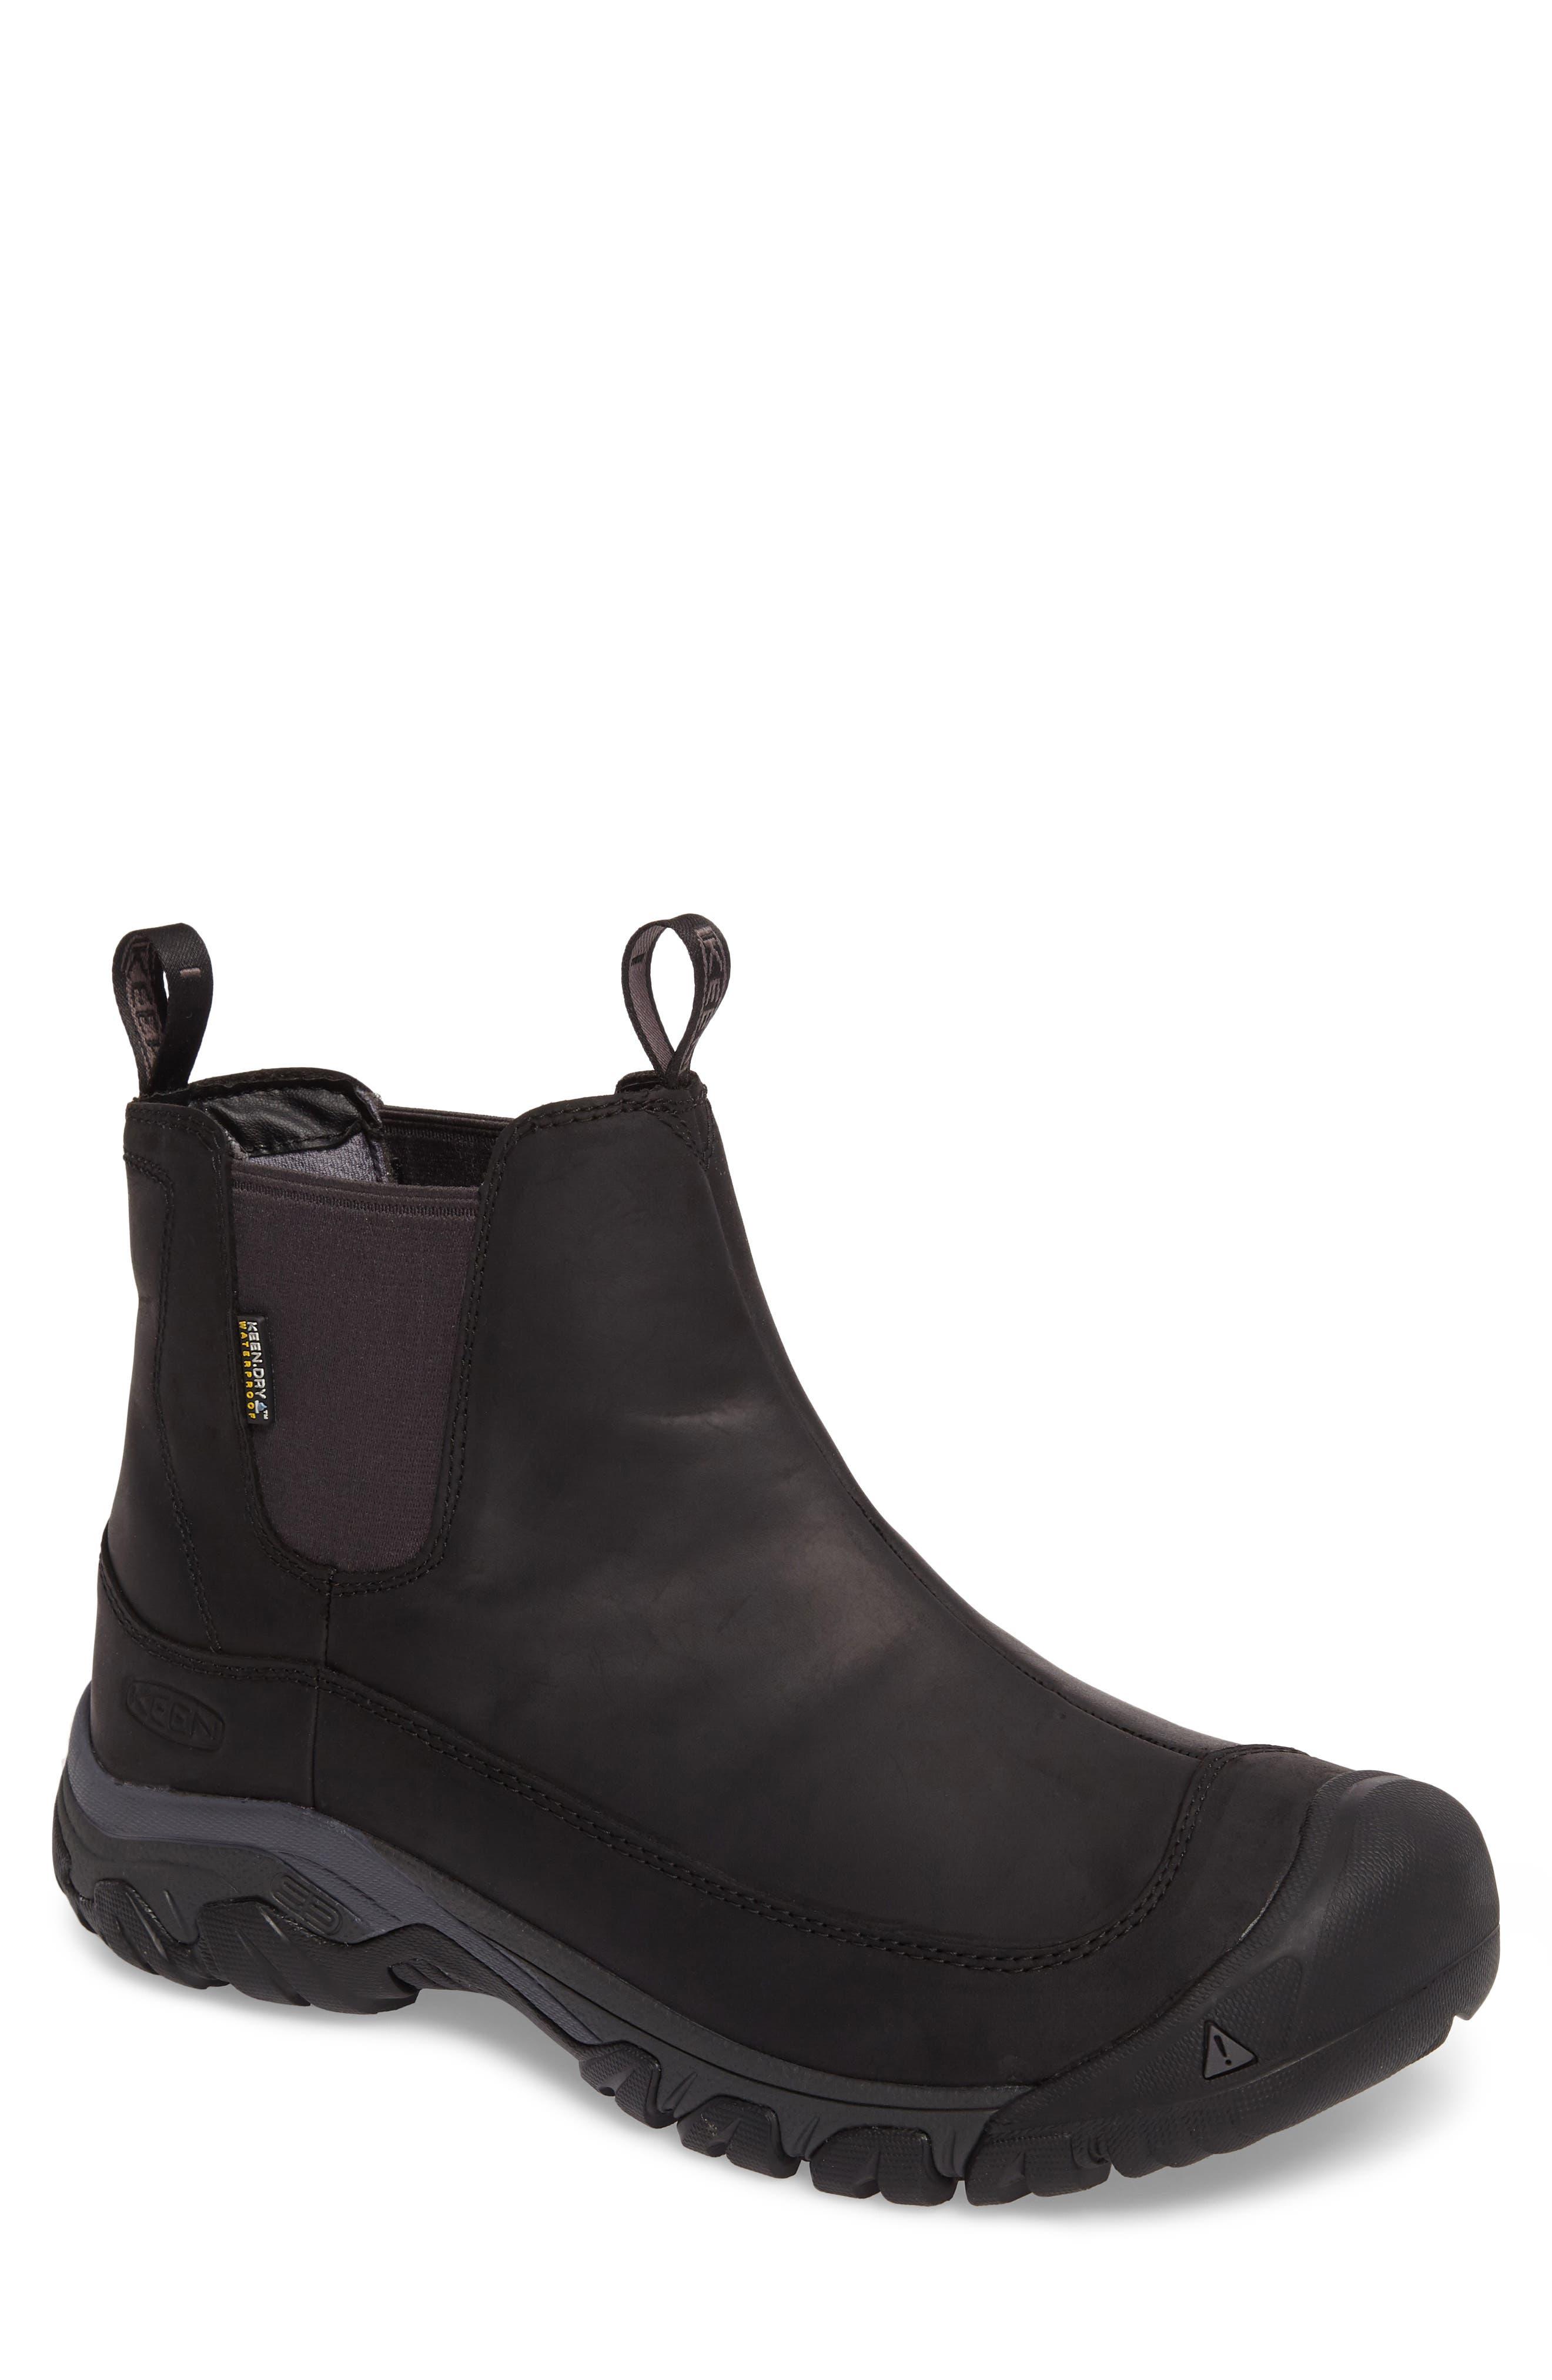 KEEN, Anchorage II Waterproof Chelsea Boot, Main thumbnail 1, color, 001